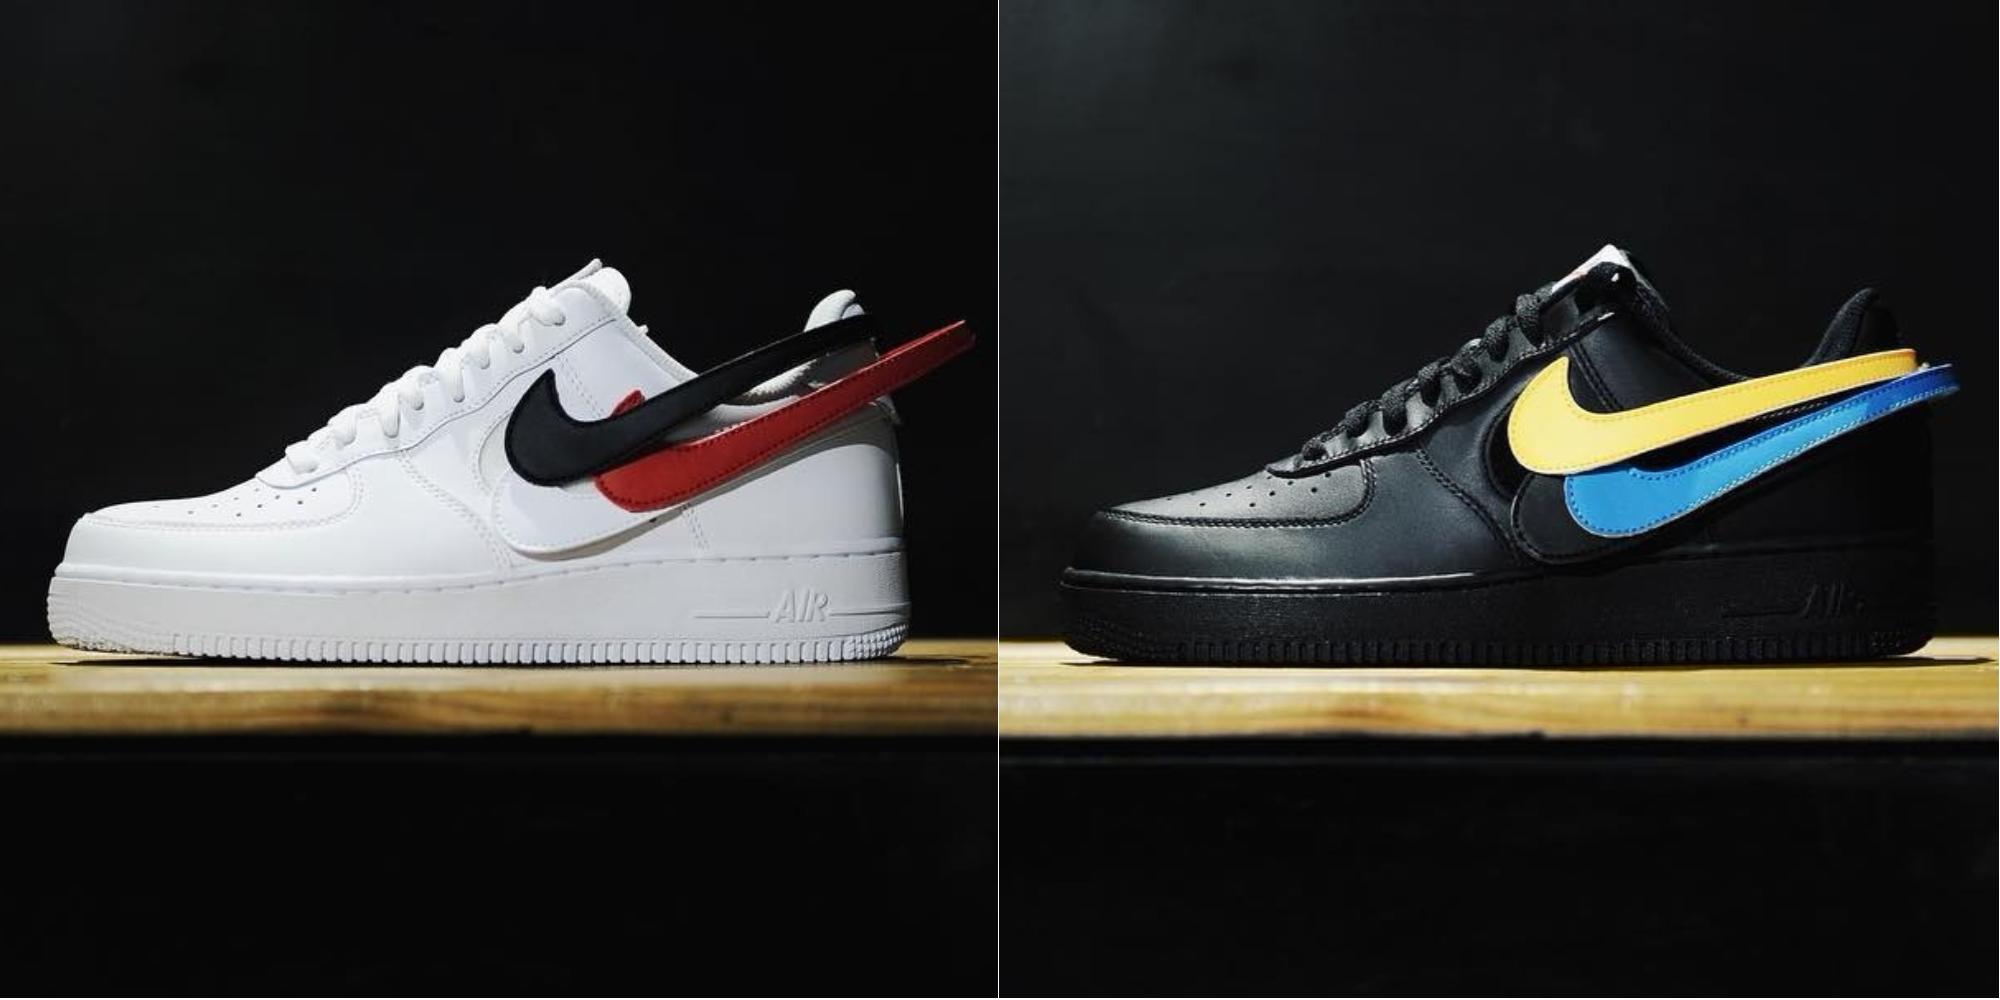 Nike 最新「附赠 5 款换勾」套路,居然连 Travis Scott AF-1「联名款」也只能坐板凳!